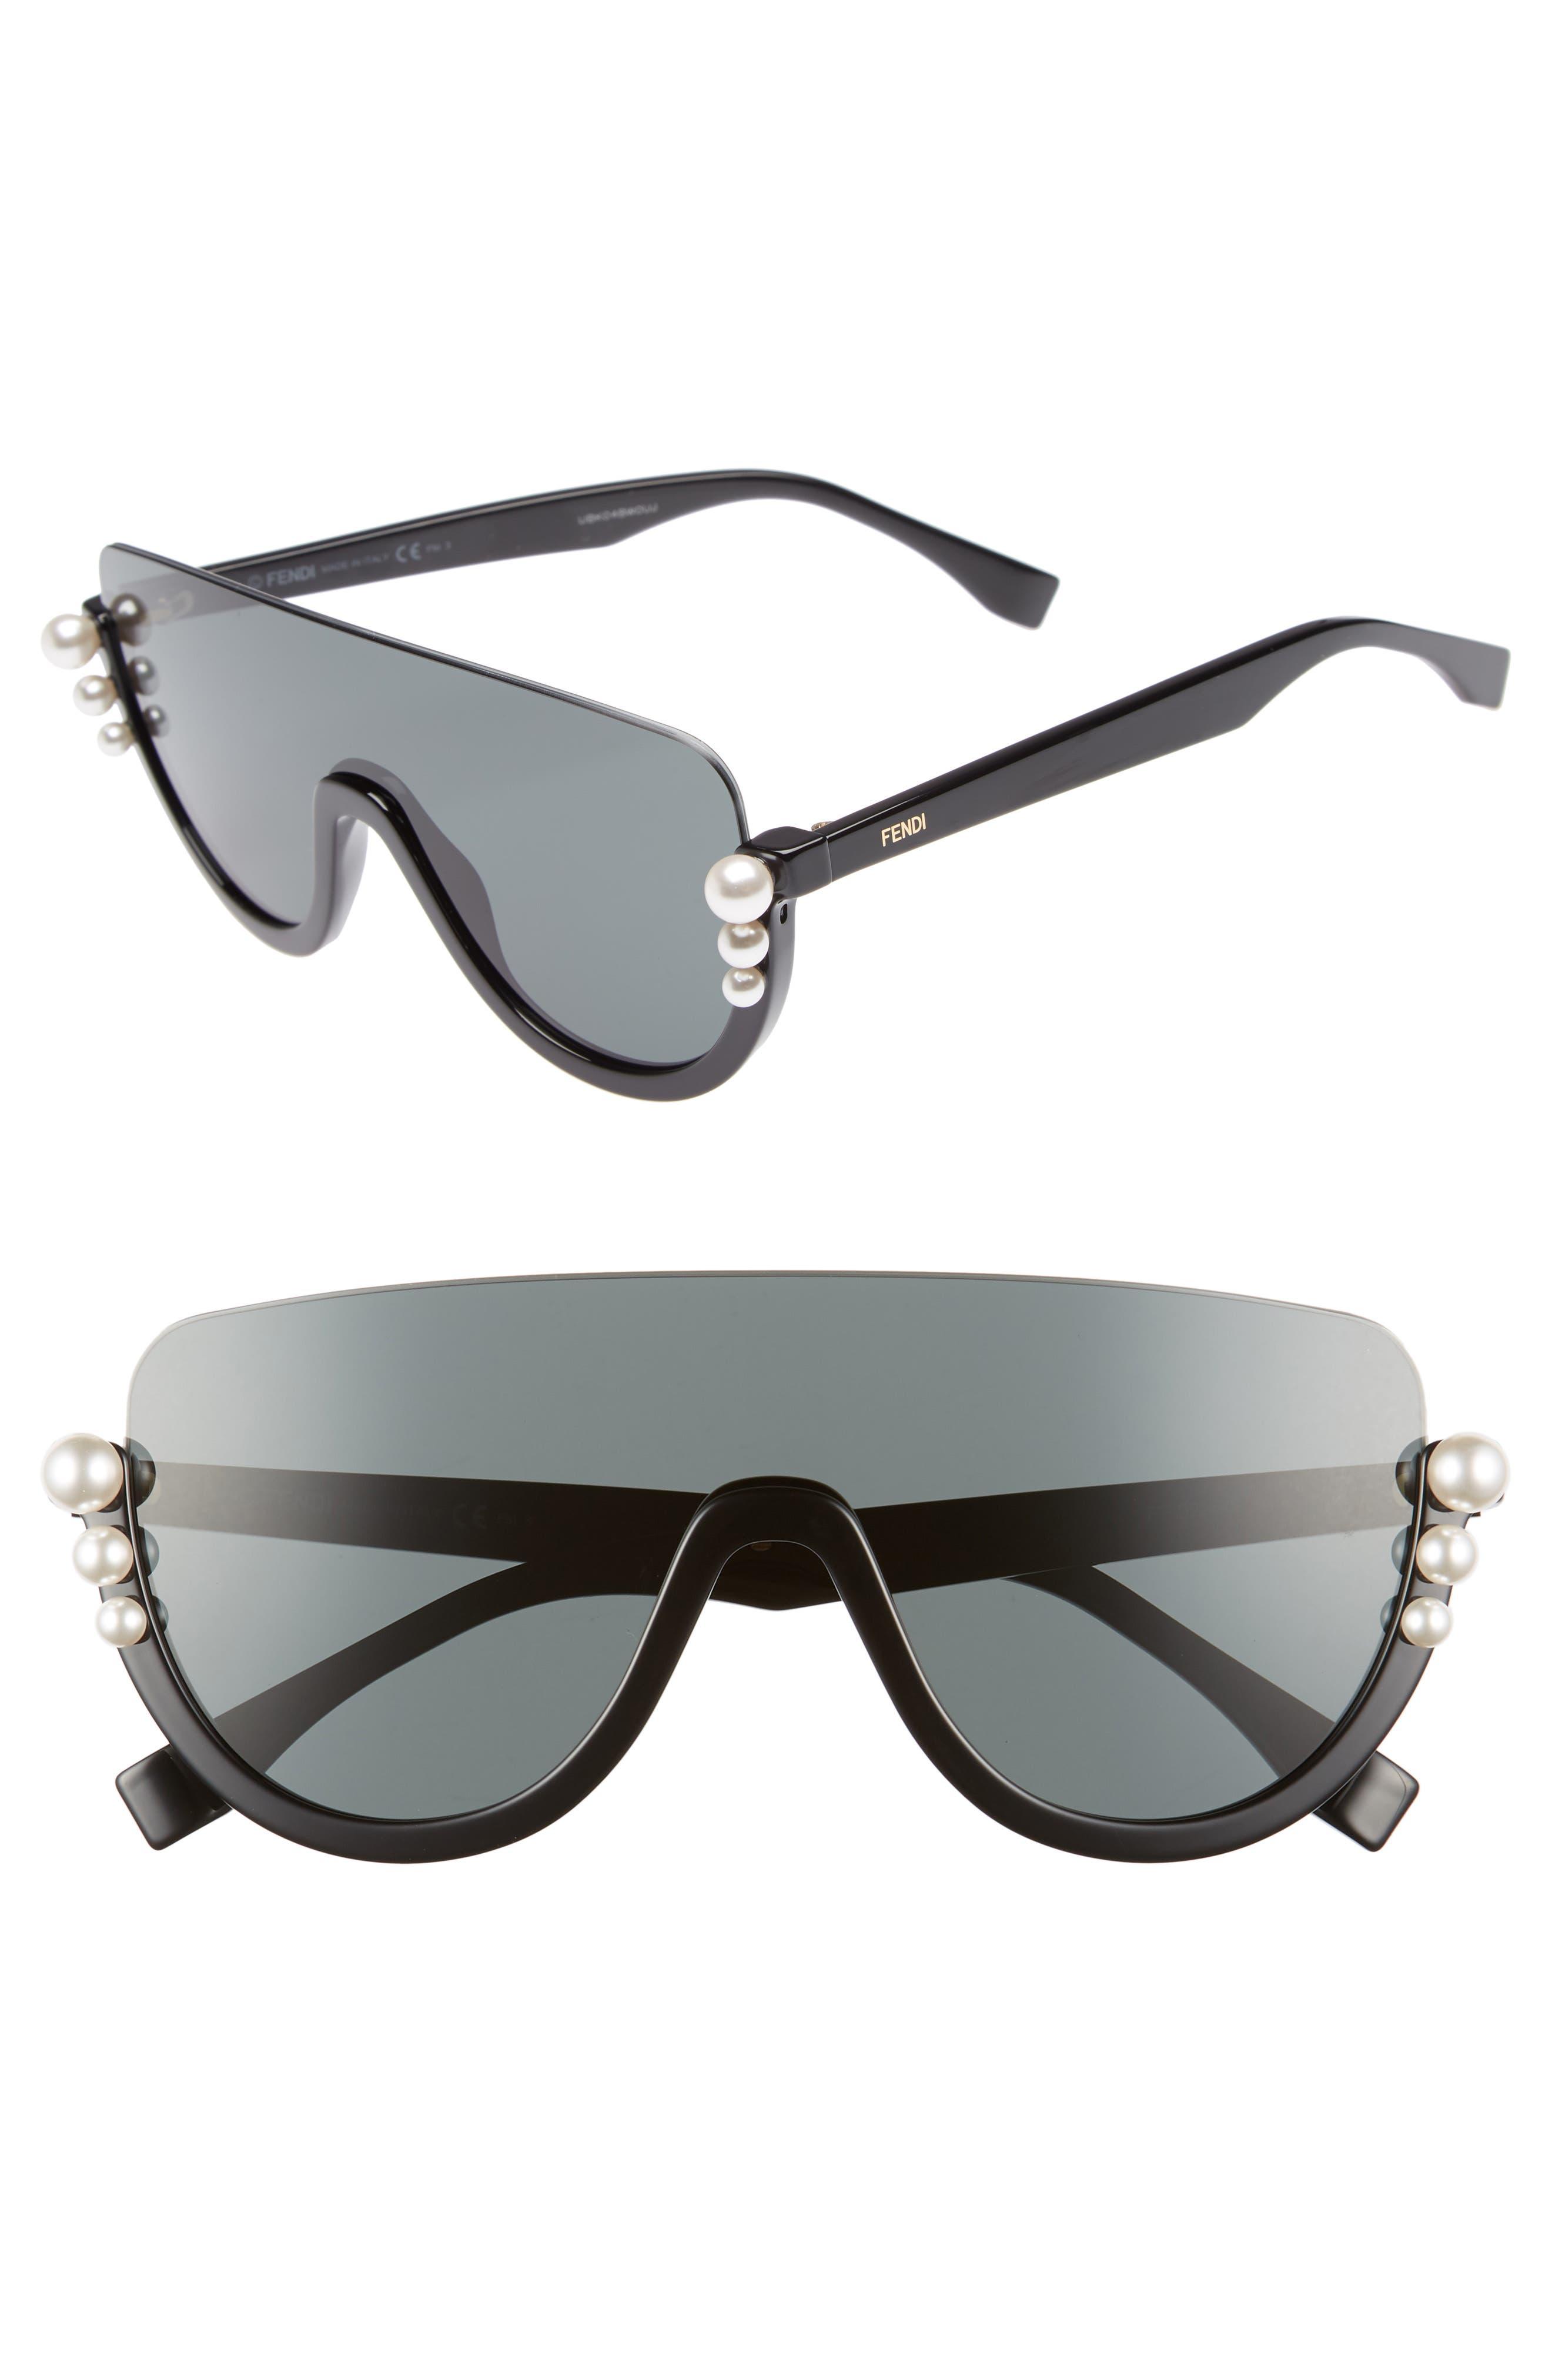 57mm Polarized Rimless Shield Sunglasses,                             Main thumbnail 1, color,                             001